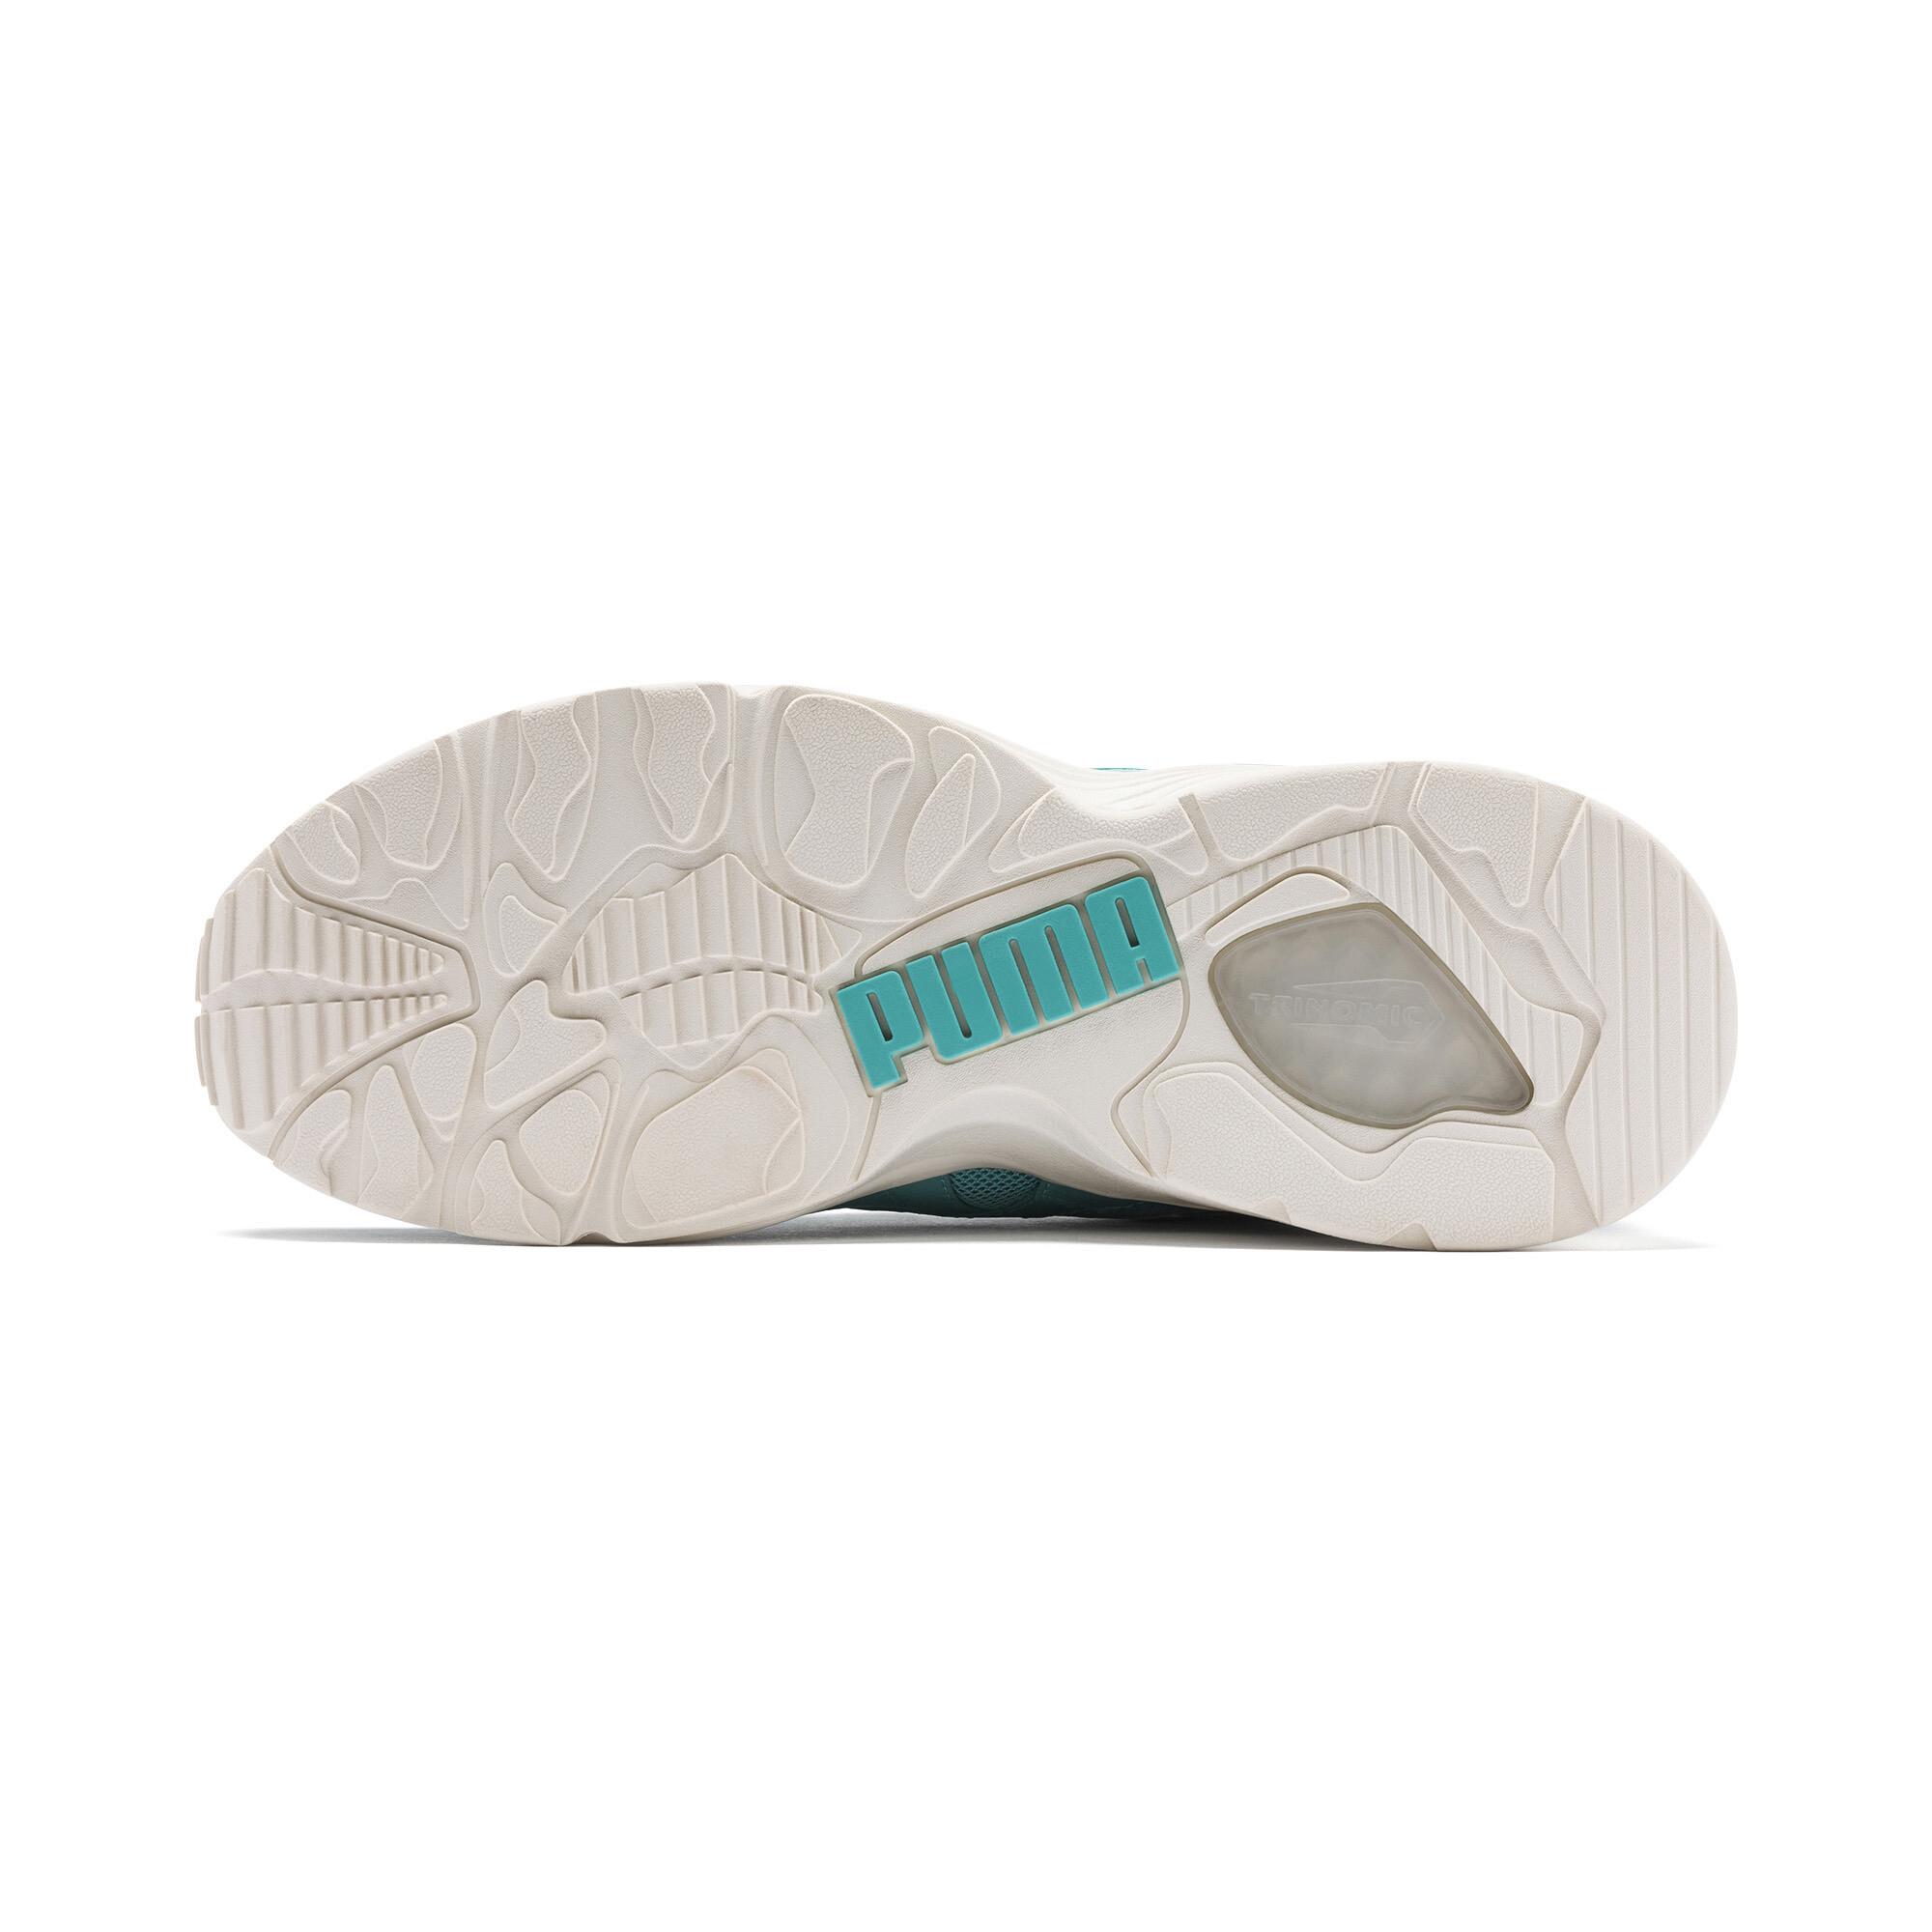 PUMA-Prevail-IR-Reality-Sneakers-Unisex-Shoe thumbnail 5